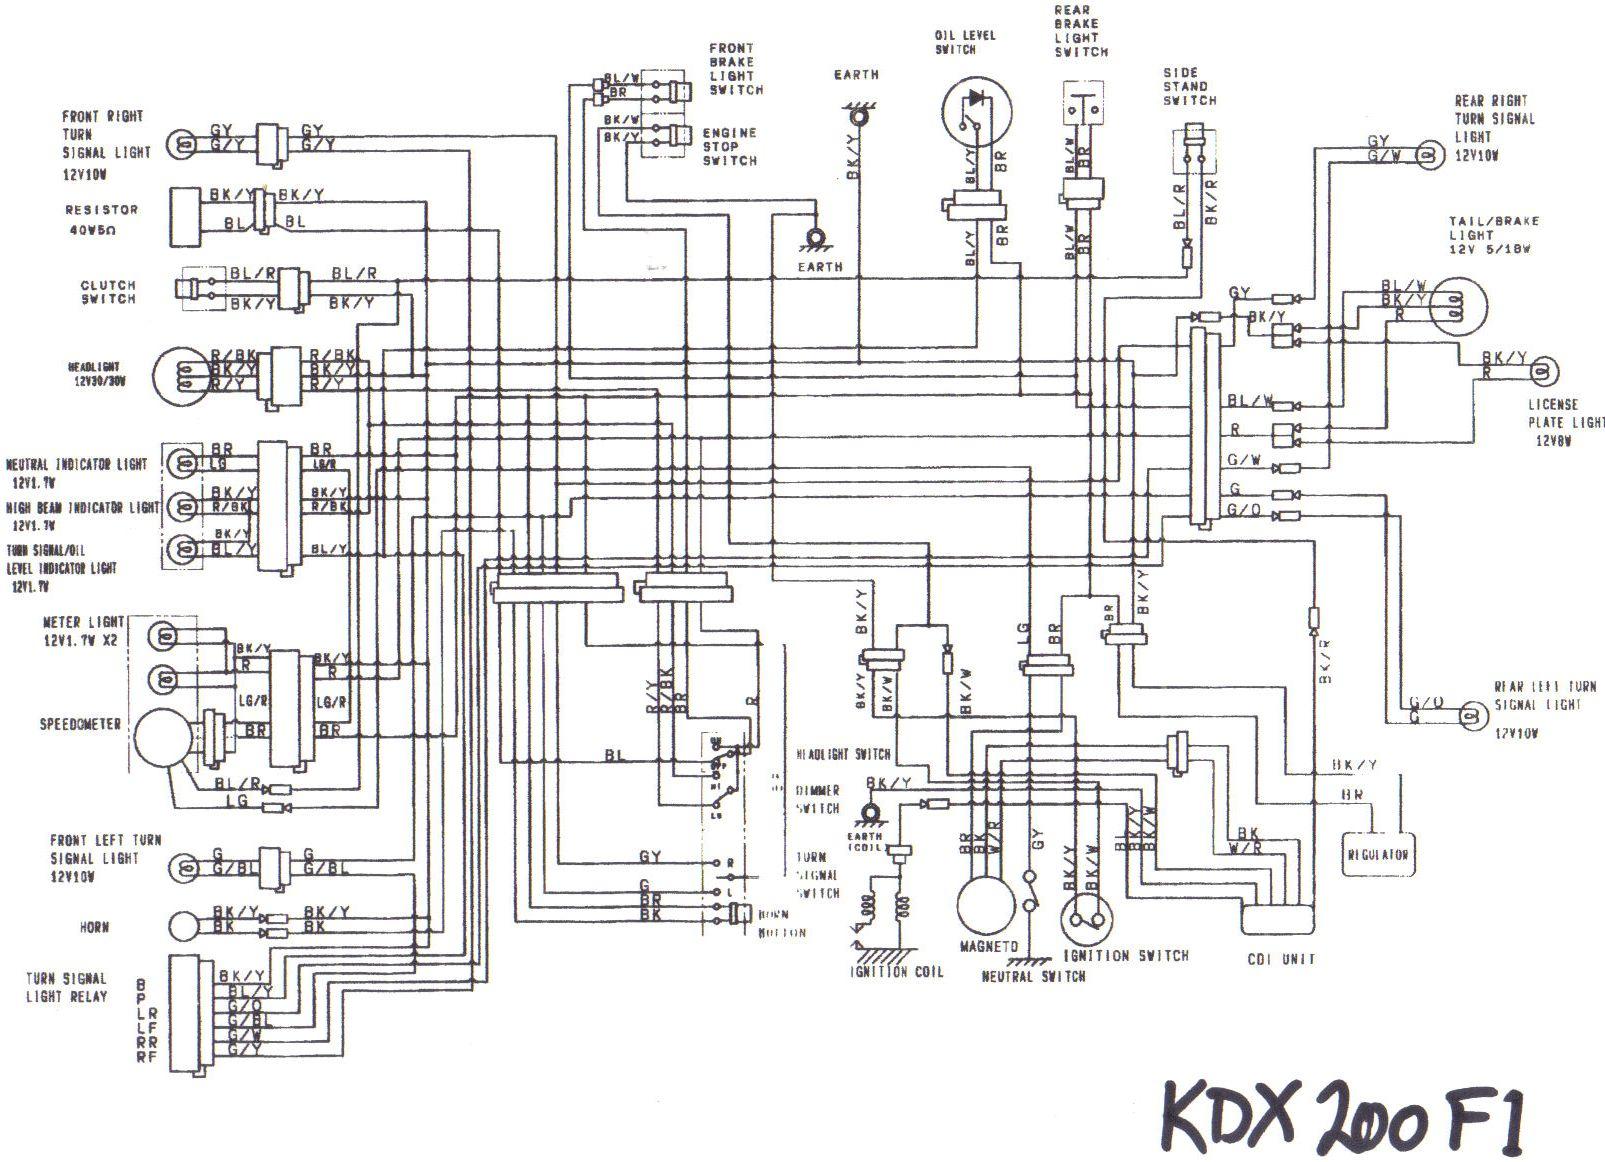 jvc kdx 200 wiring diagram